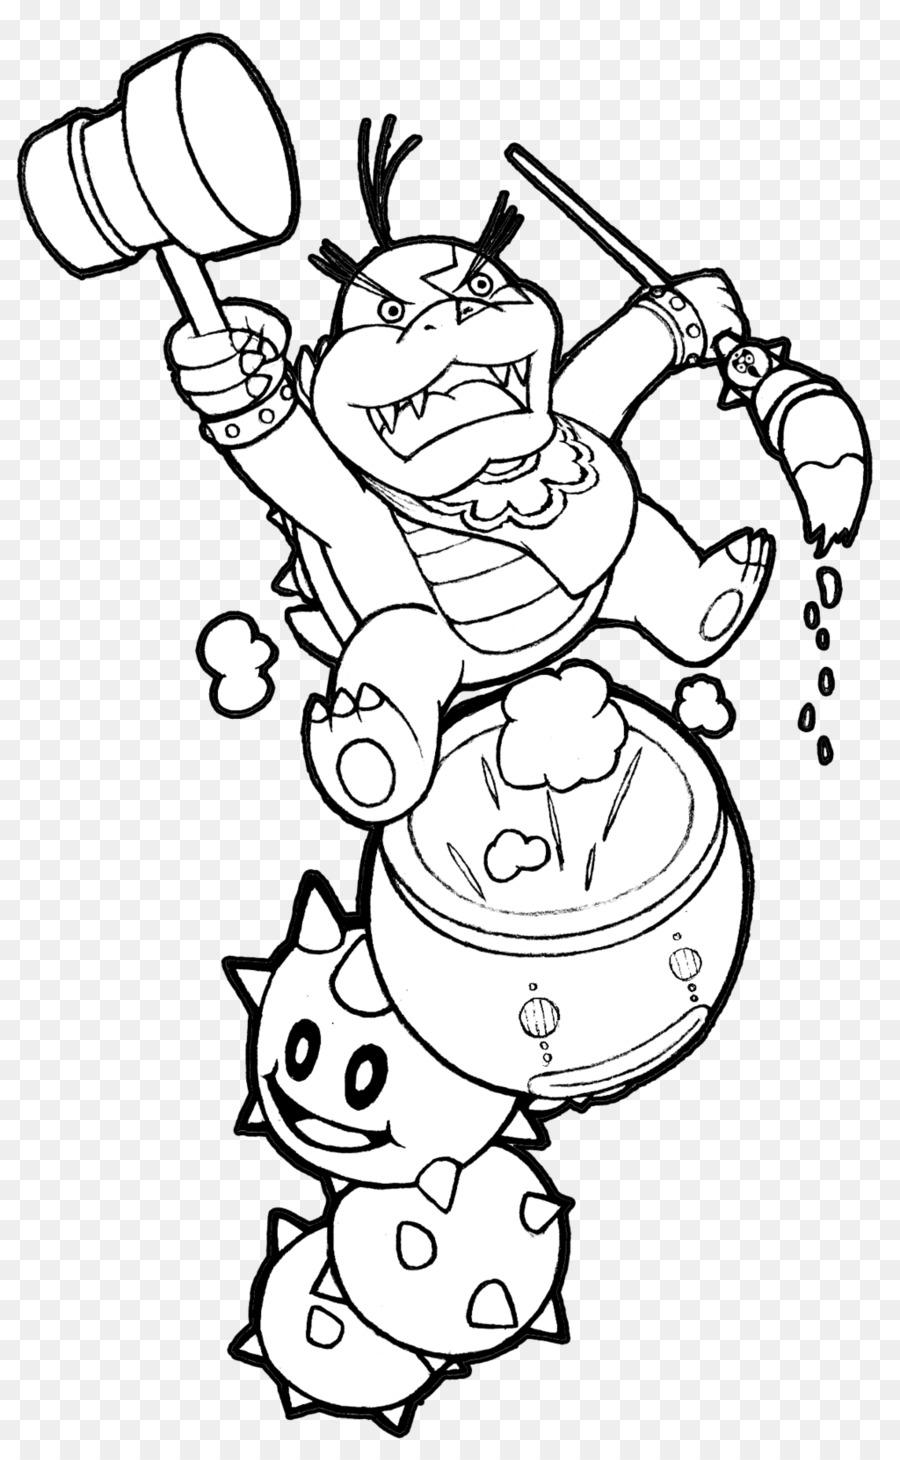 Bowser New Super Mario Bros. Wii Coloring book Koopalings - mario ...